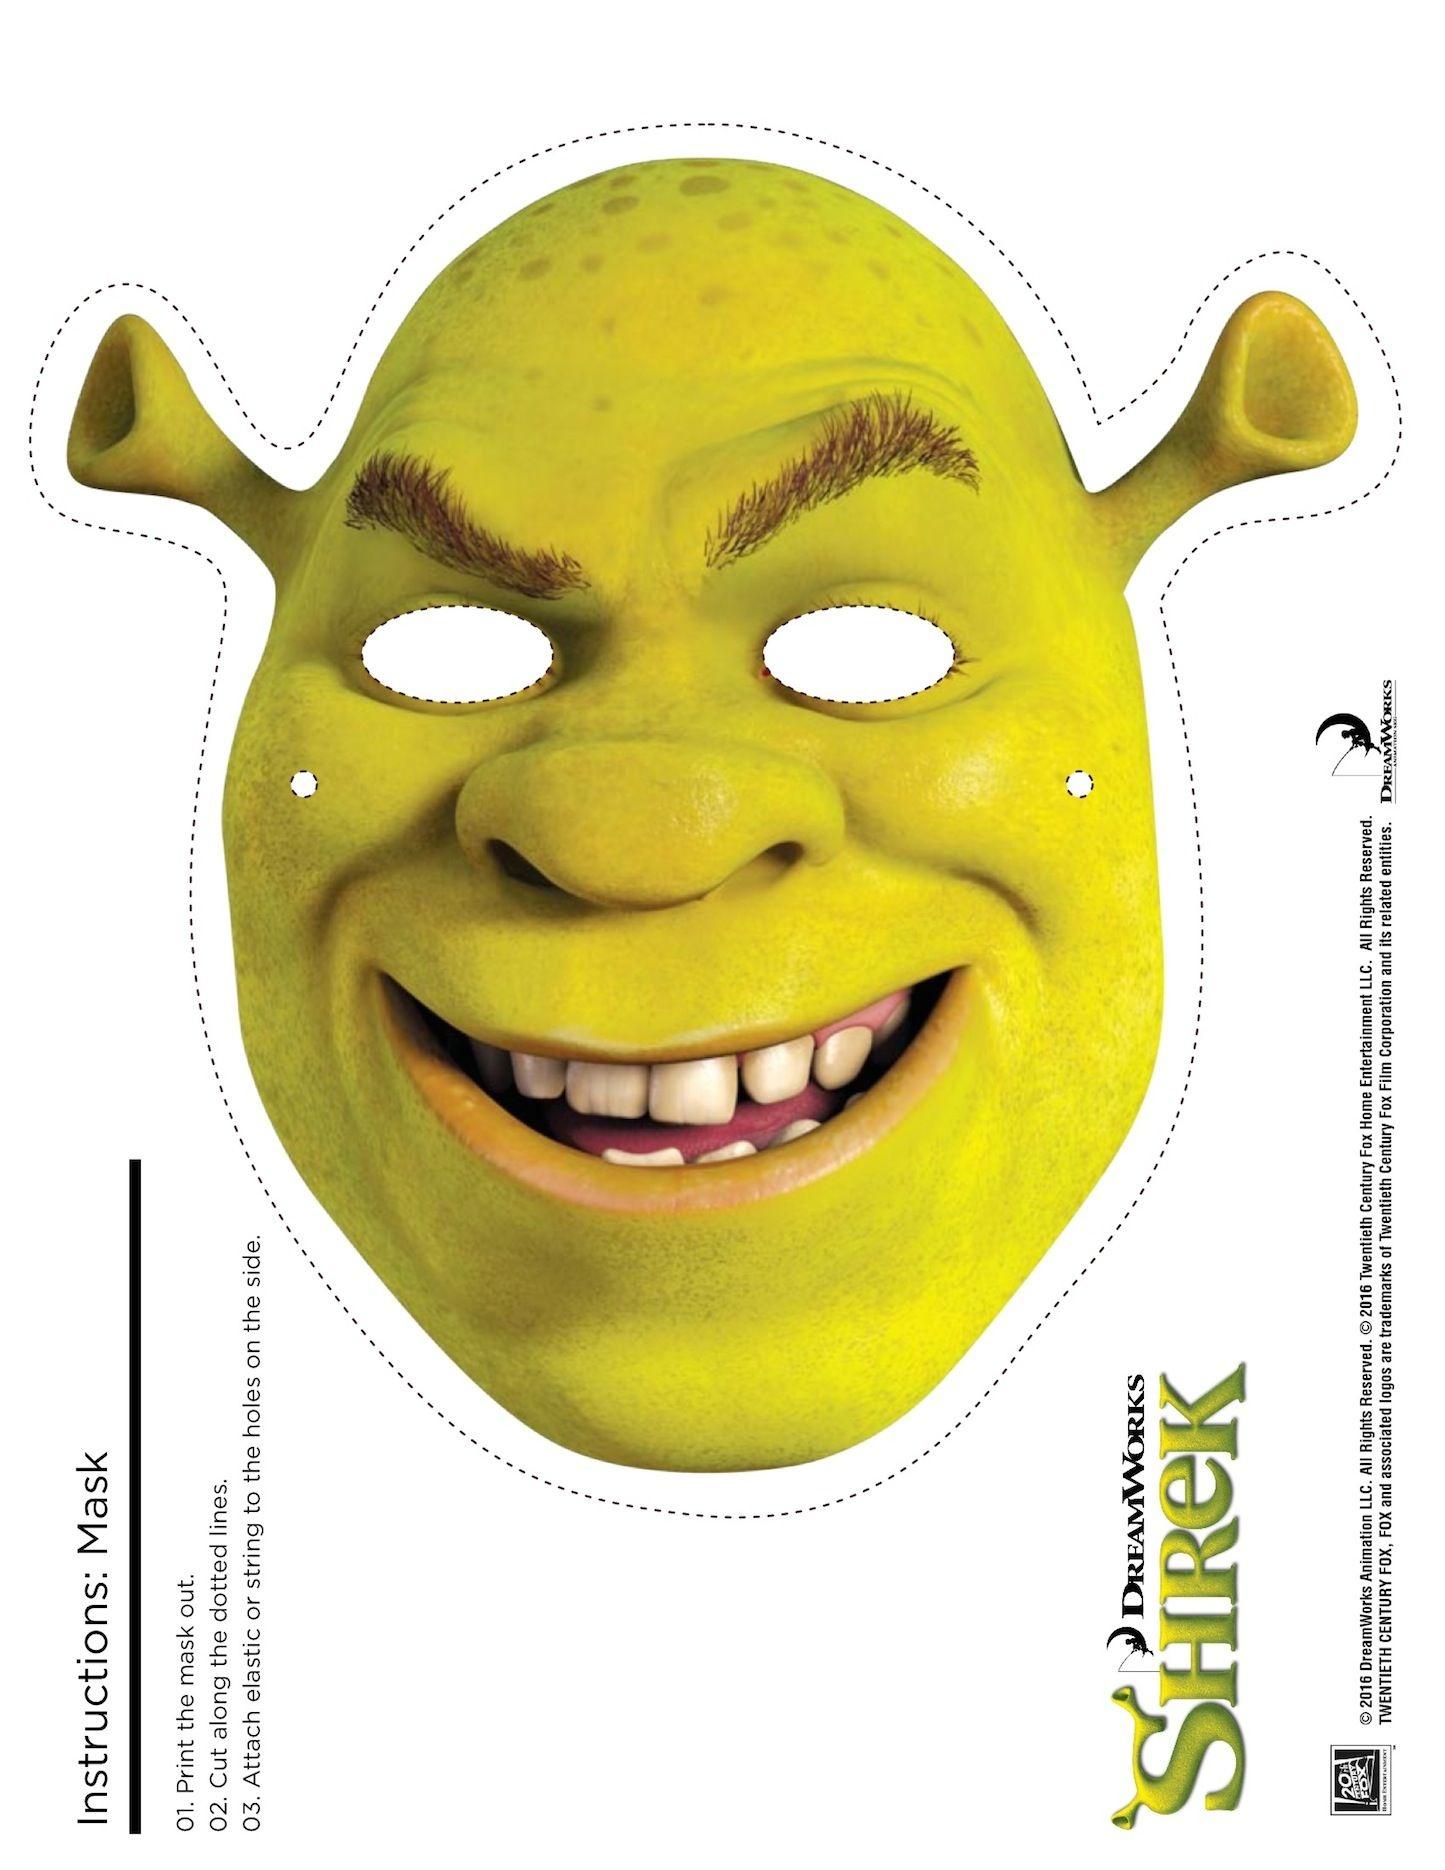 Shrek Photo Booth Props: Free Printable Shrek Mask | Sebastian's - Free Printable Shrek Birthday Invitations